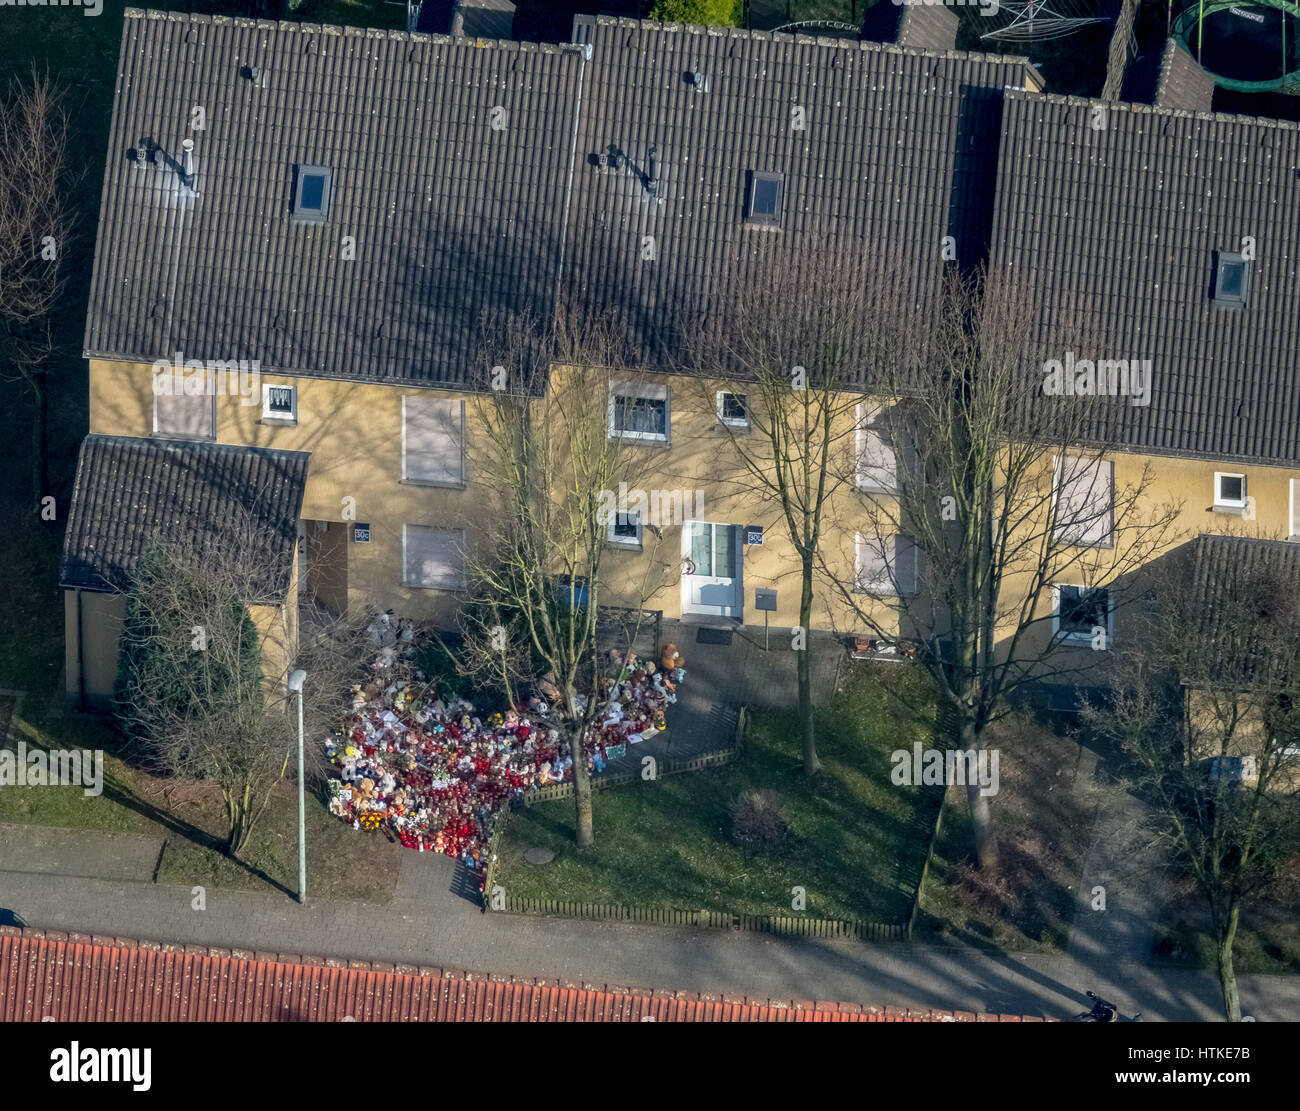 Herne child murder case, Settlement in Dannekamp, home of murderer Marcel Hesse and the nine-year-old victim, toys - Stock Image